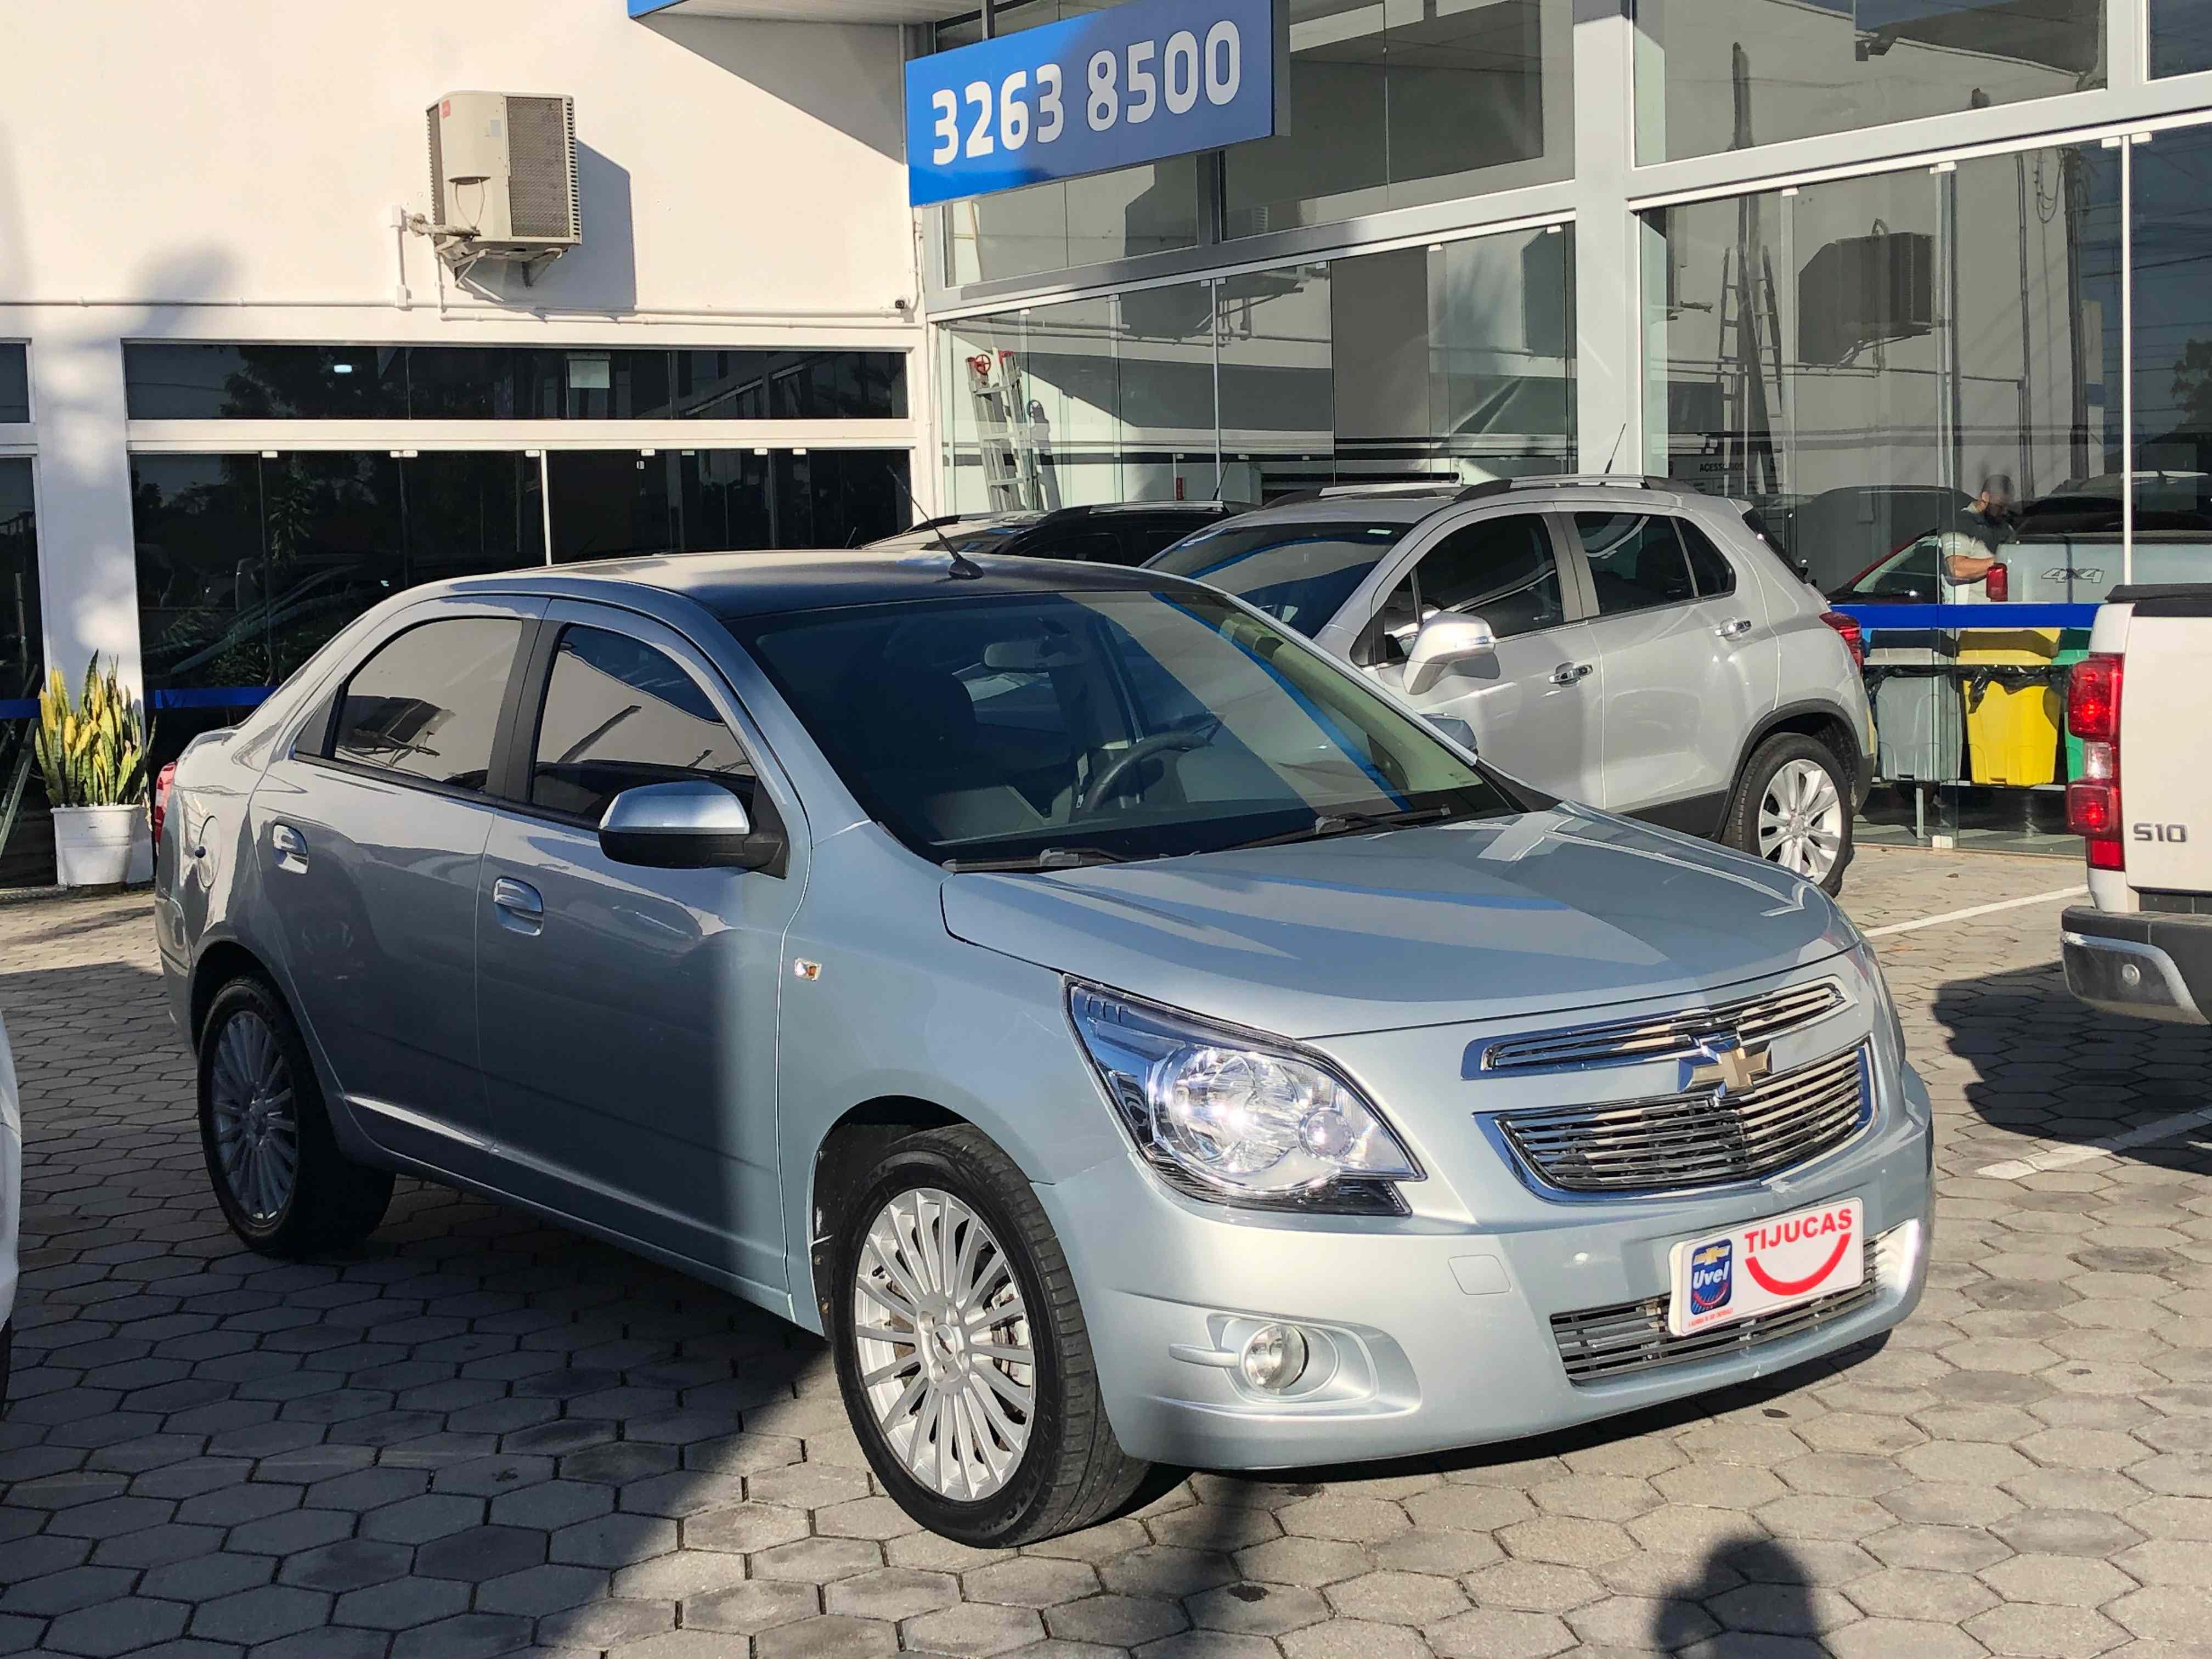 Chevrolet Cobalt LT 1.4L 2012